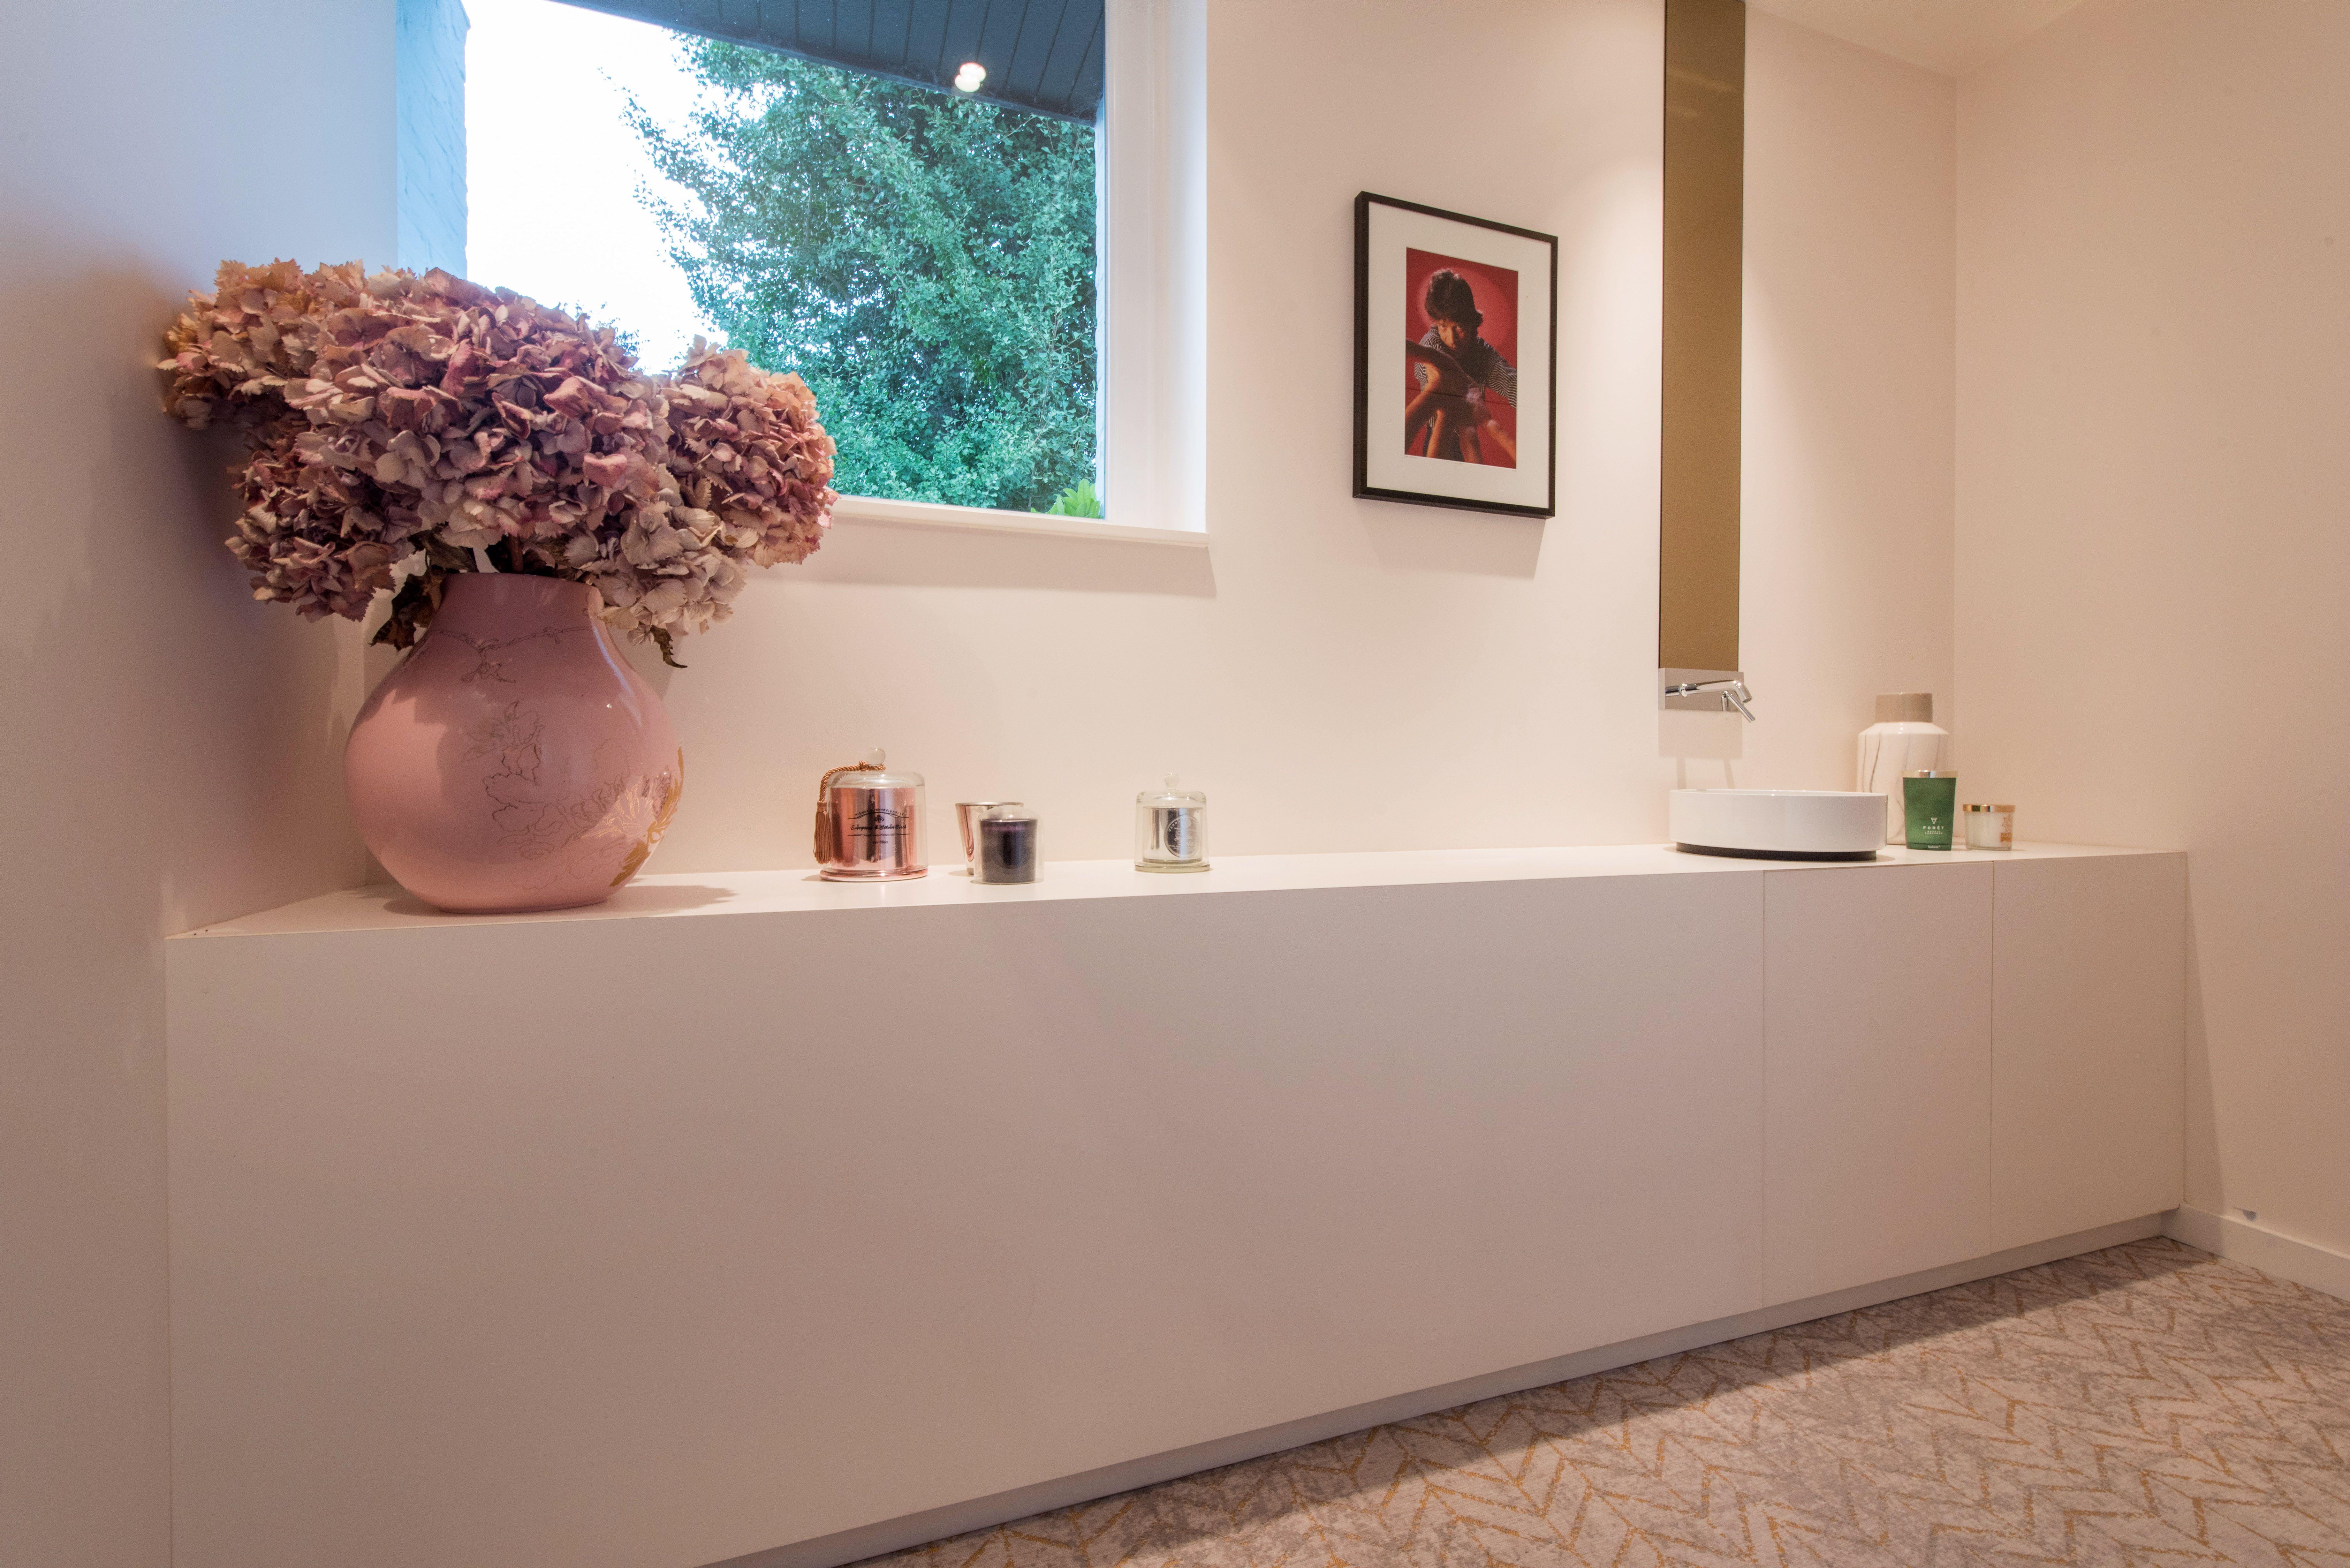 Maison Moderne Contemporain Wattel Decoration Design Salle